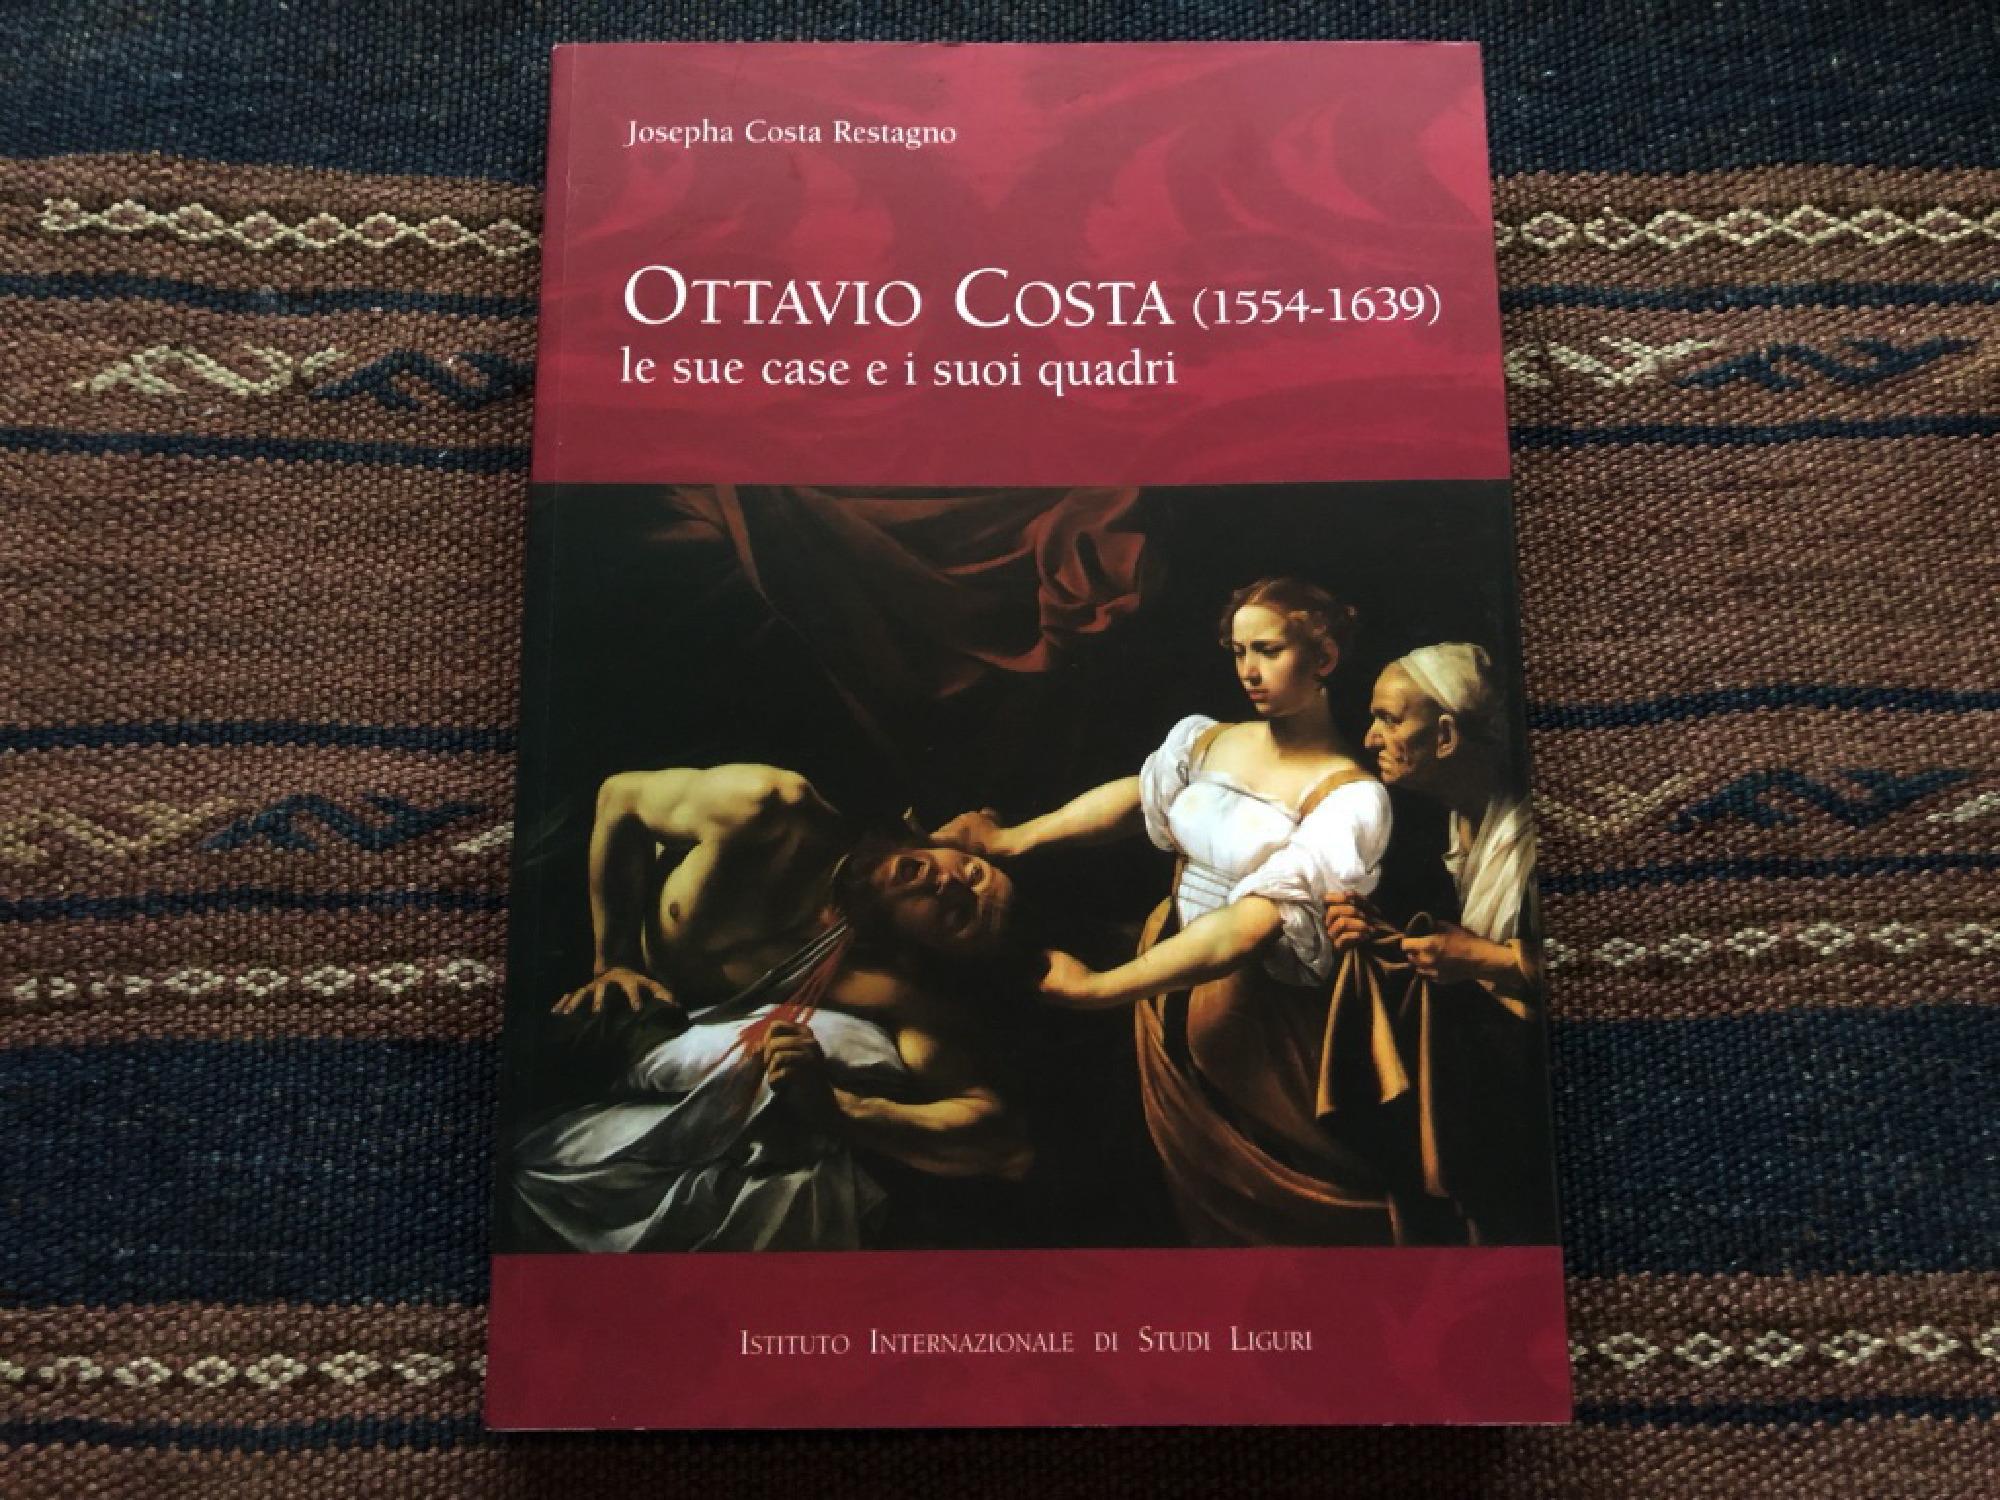 OTTAVIO COSTA